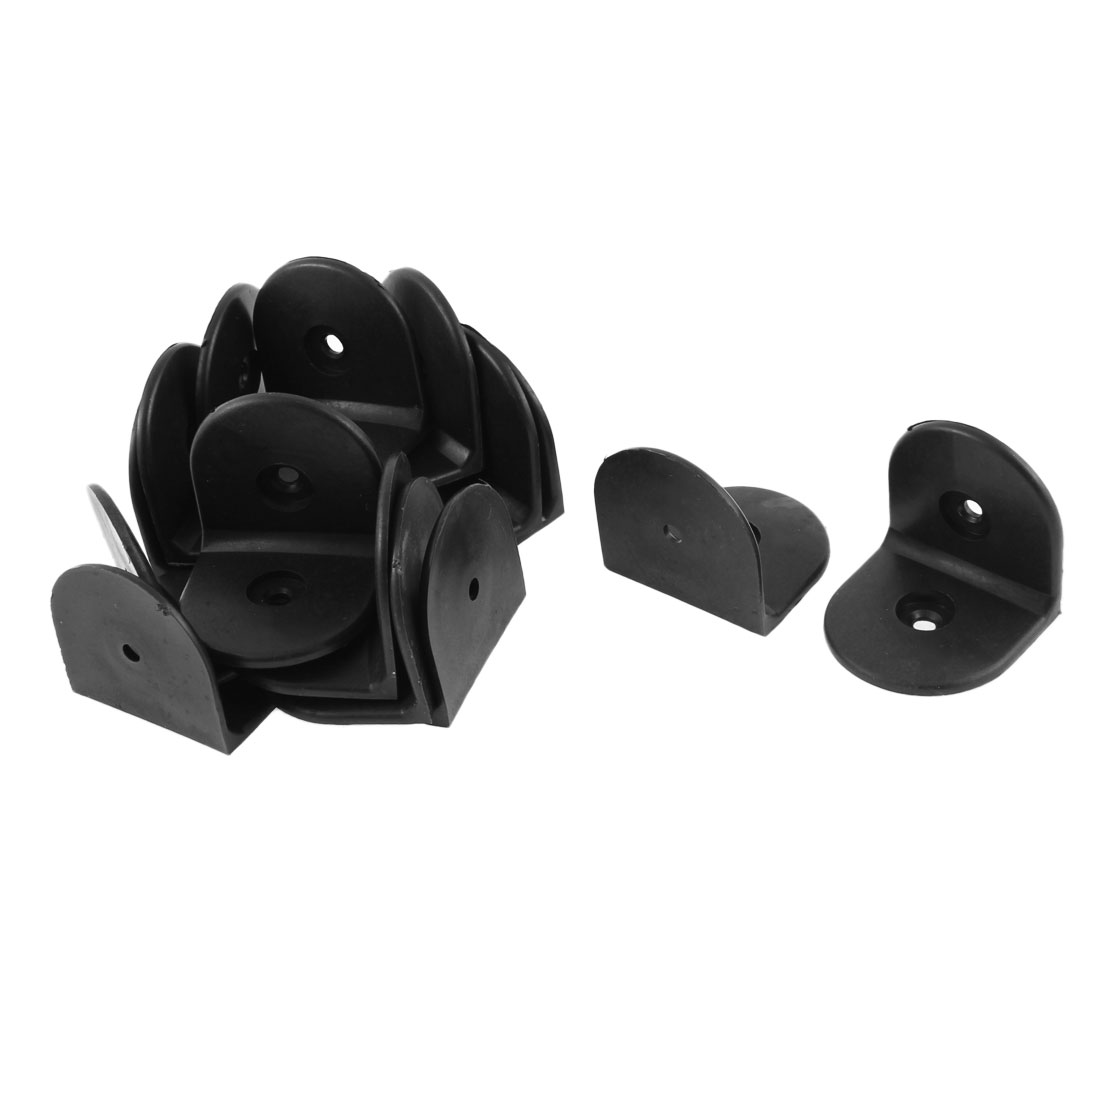 Plastic Corner Brace Joint Right Angle Bracket Black 51 x 51 x 52mm 15pcs